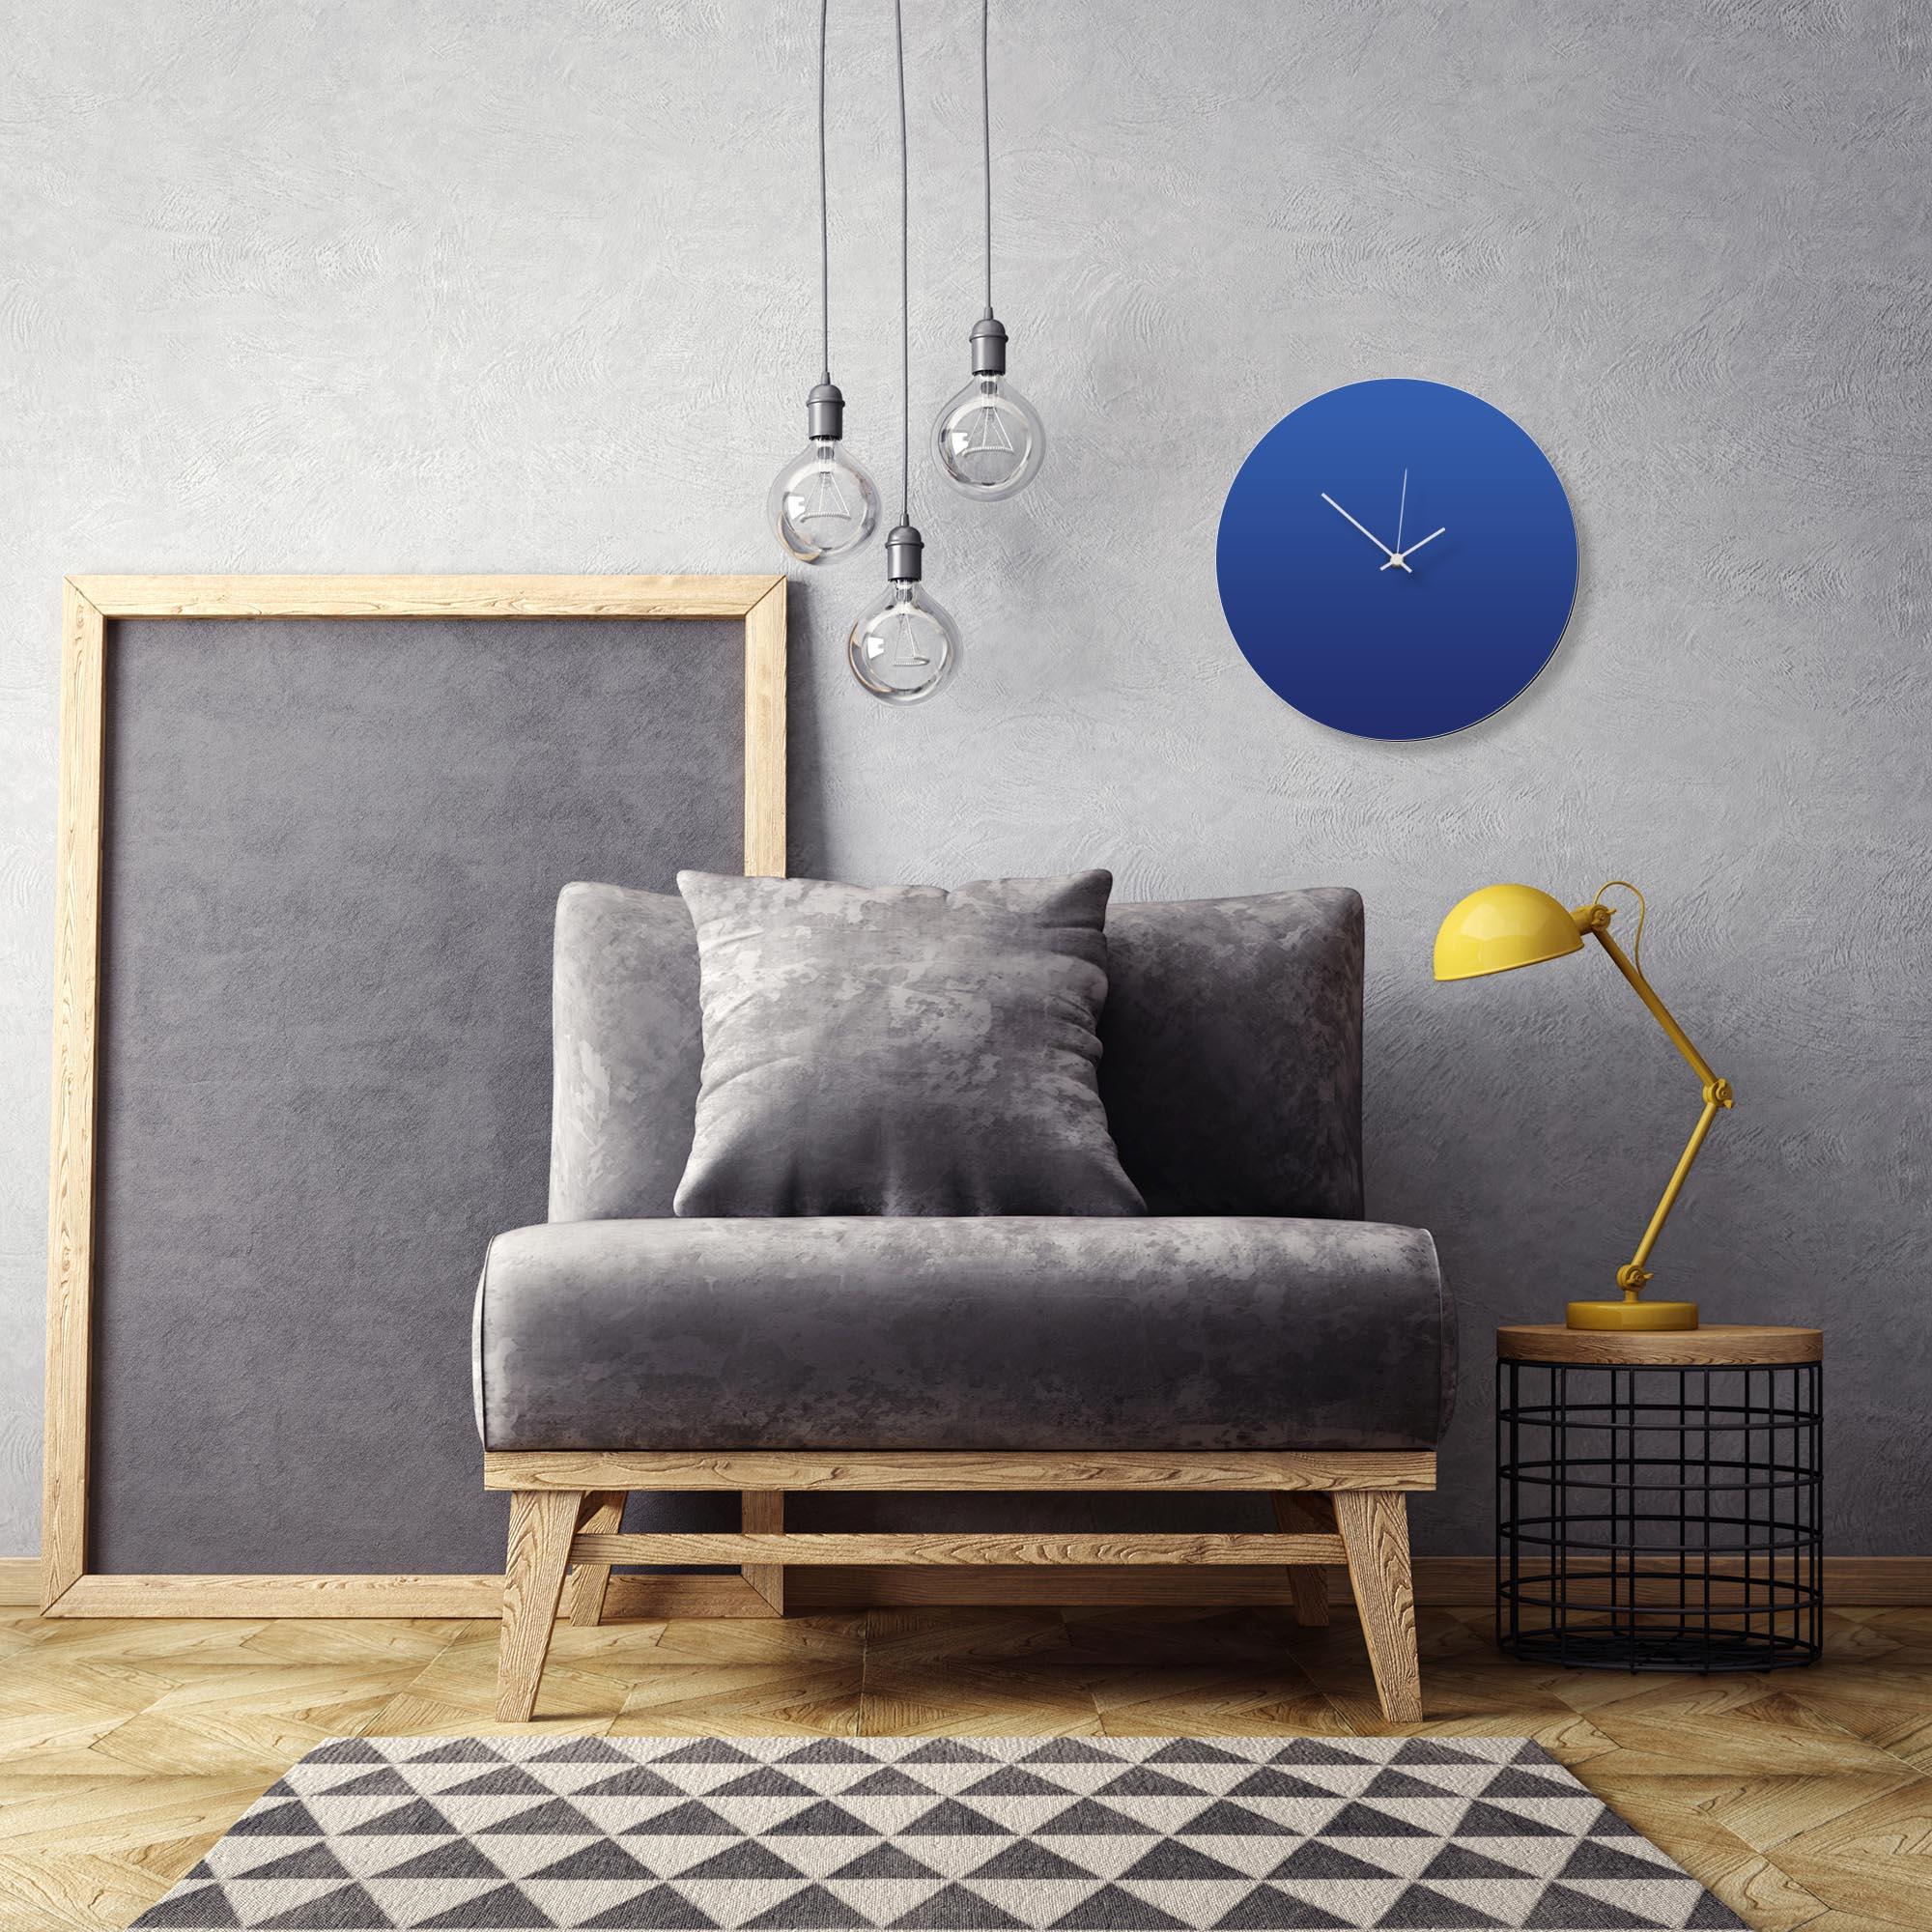 Blueout White Circle Clock by Adam Schwoeppe Contemporary Clock on Aluminum Polymetal - Alternate View 1